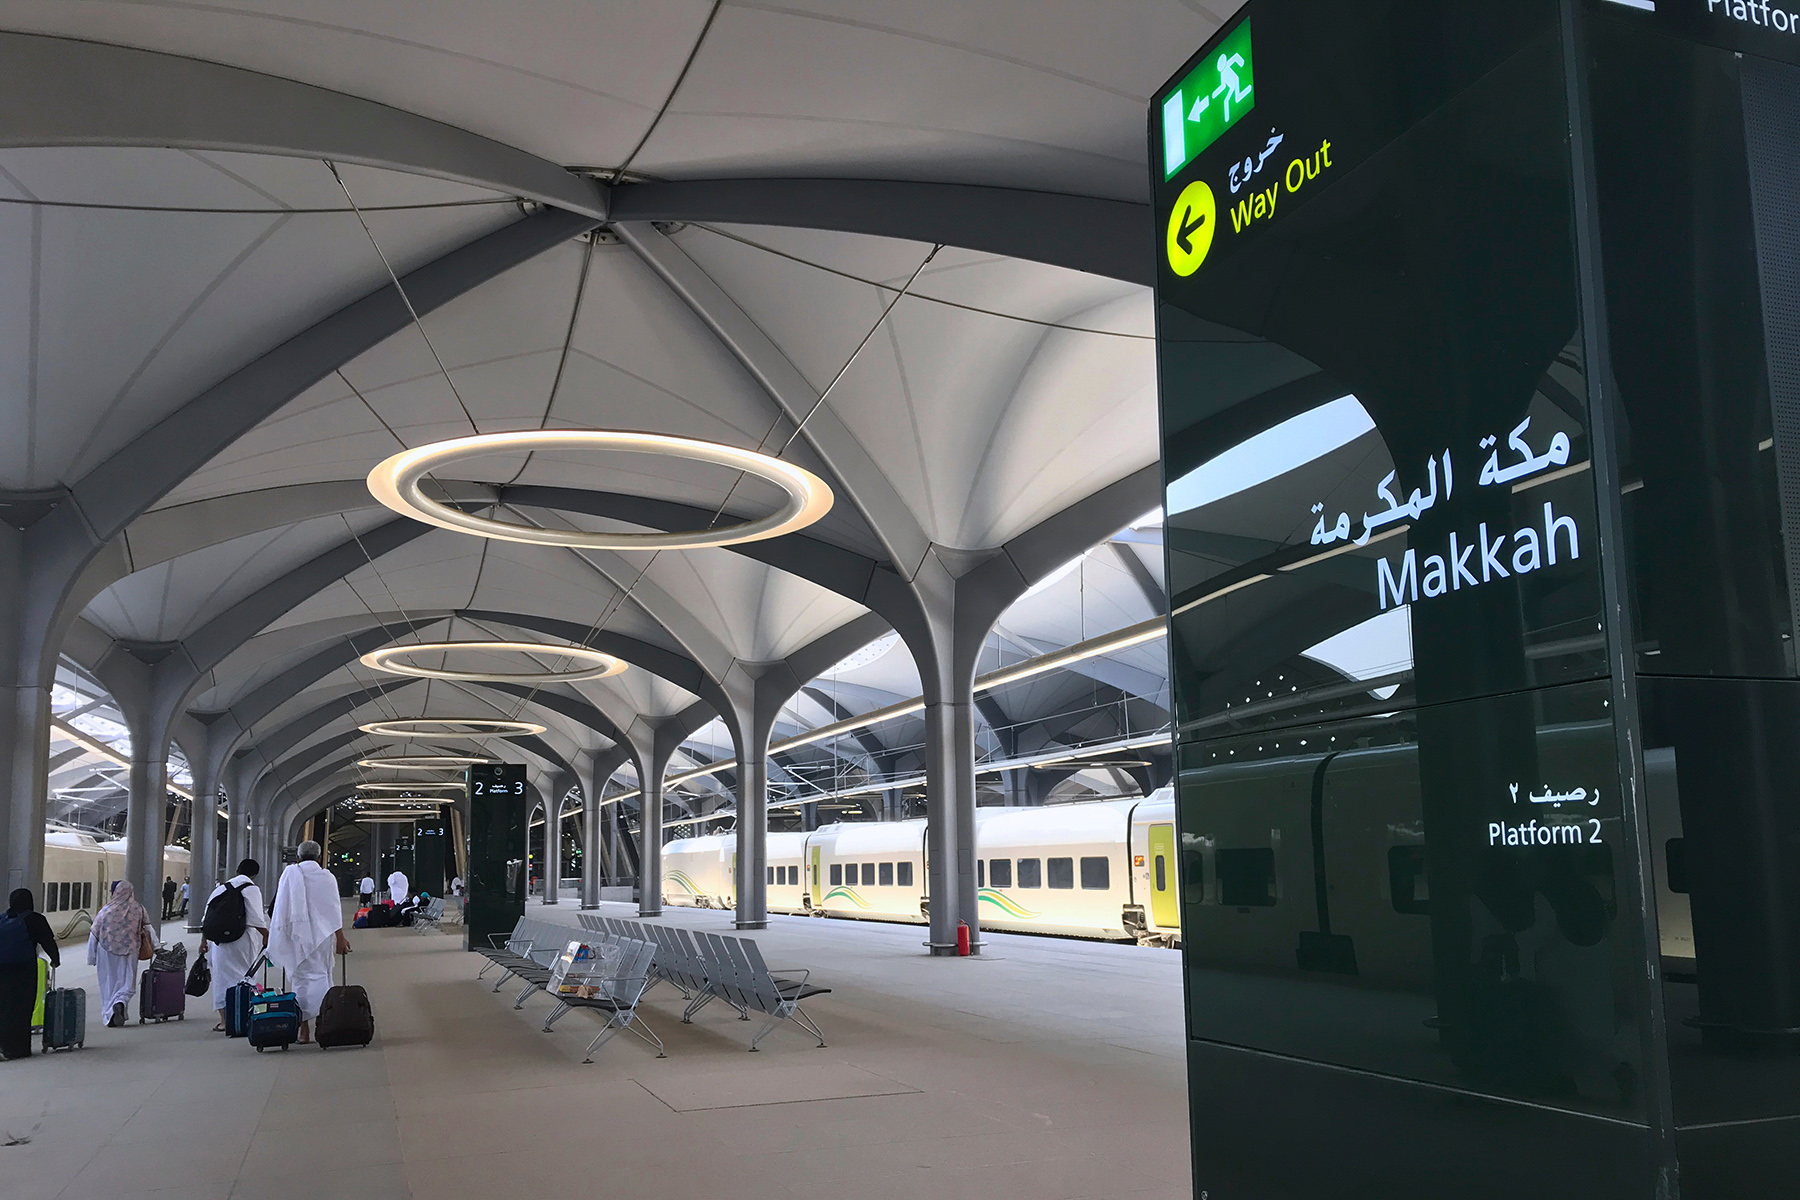 Train station platform in Mecca